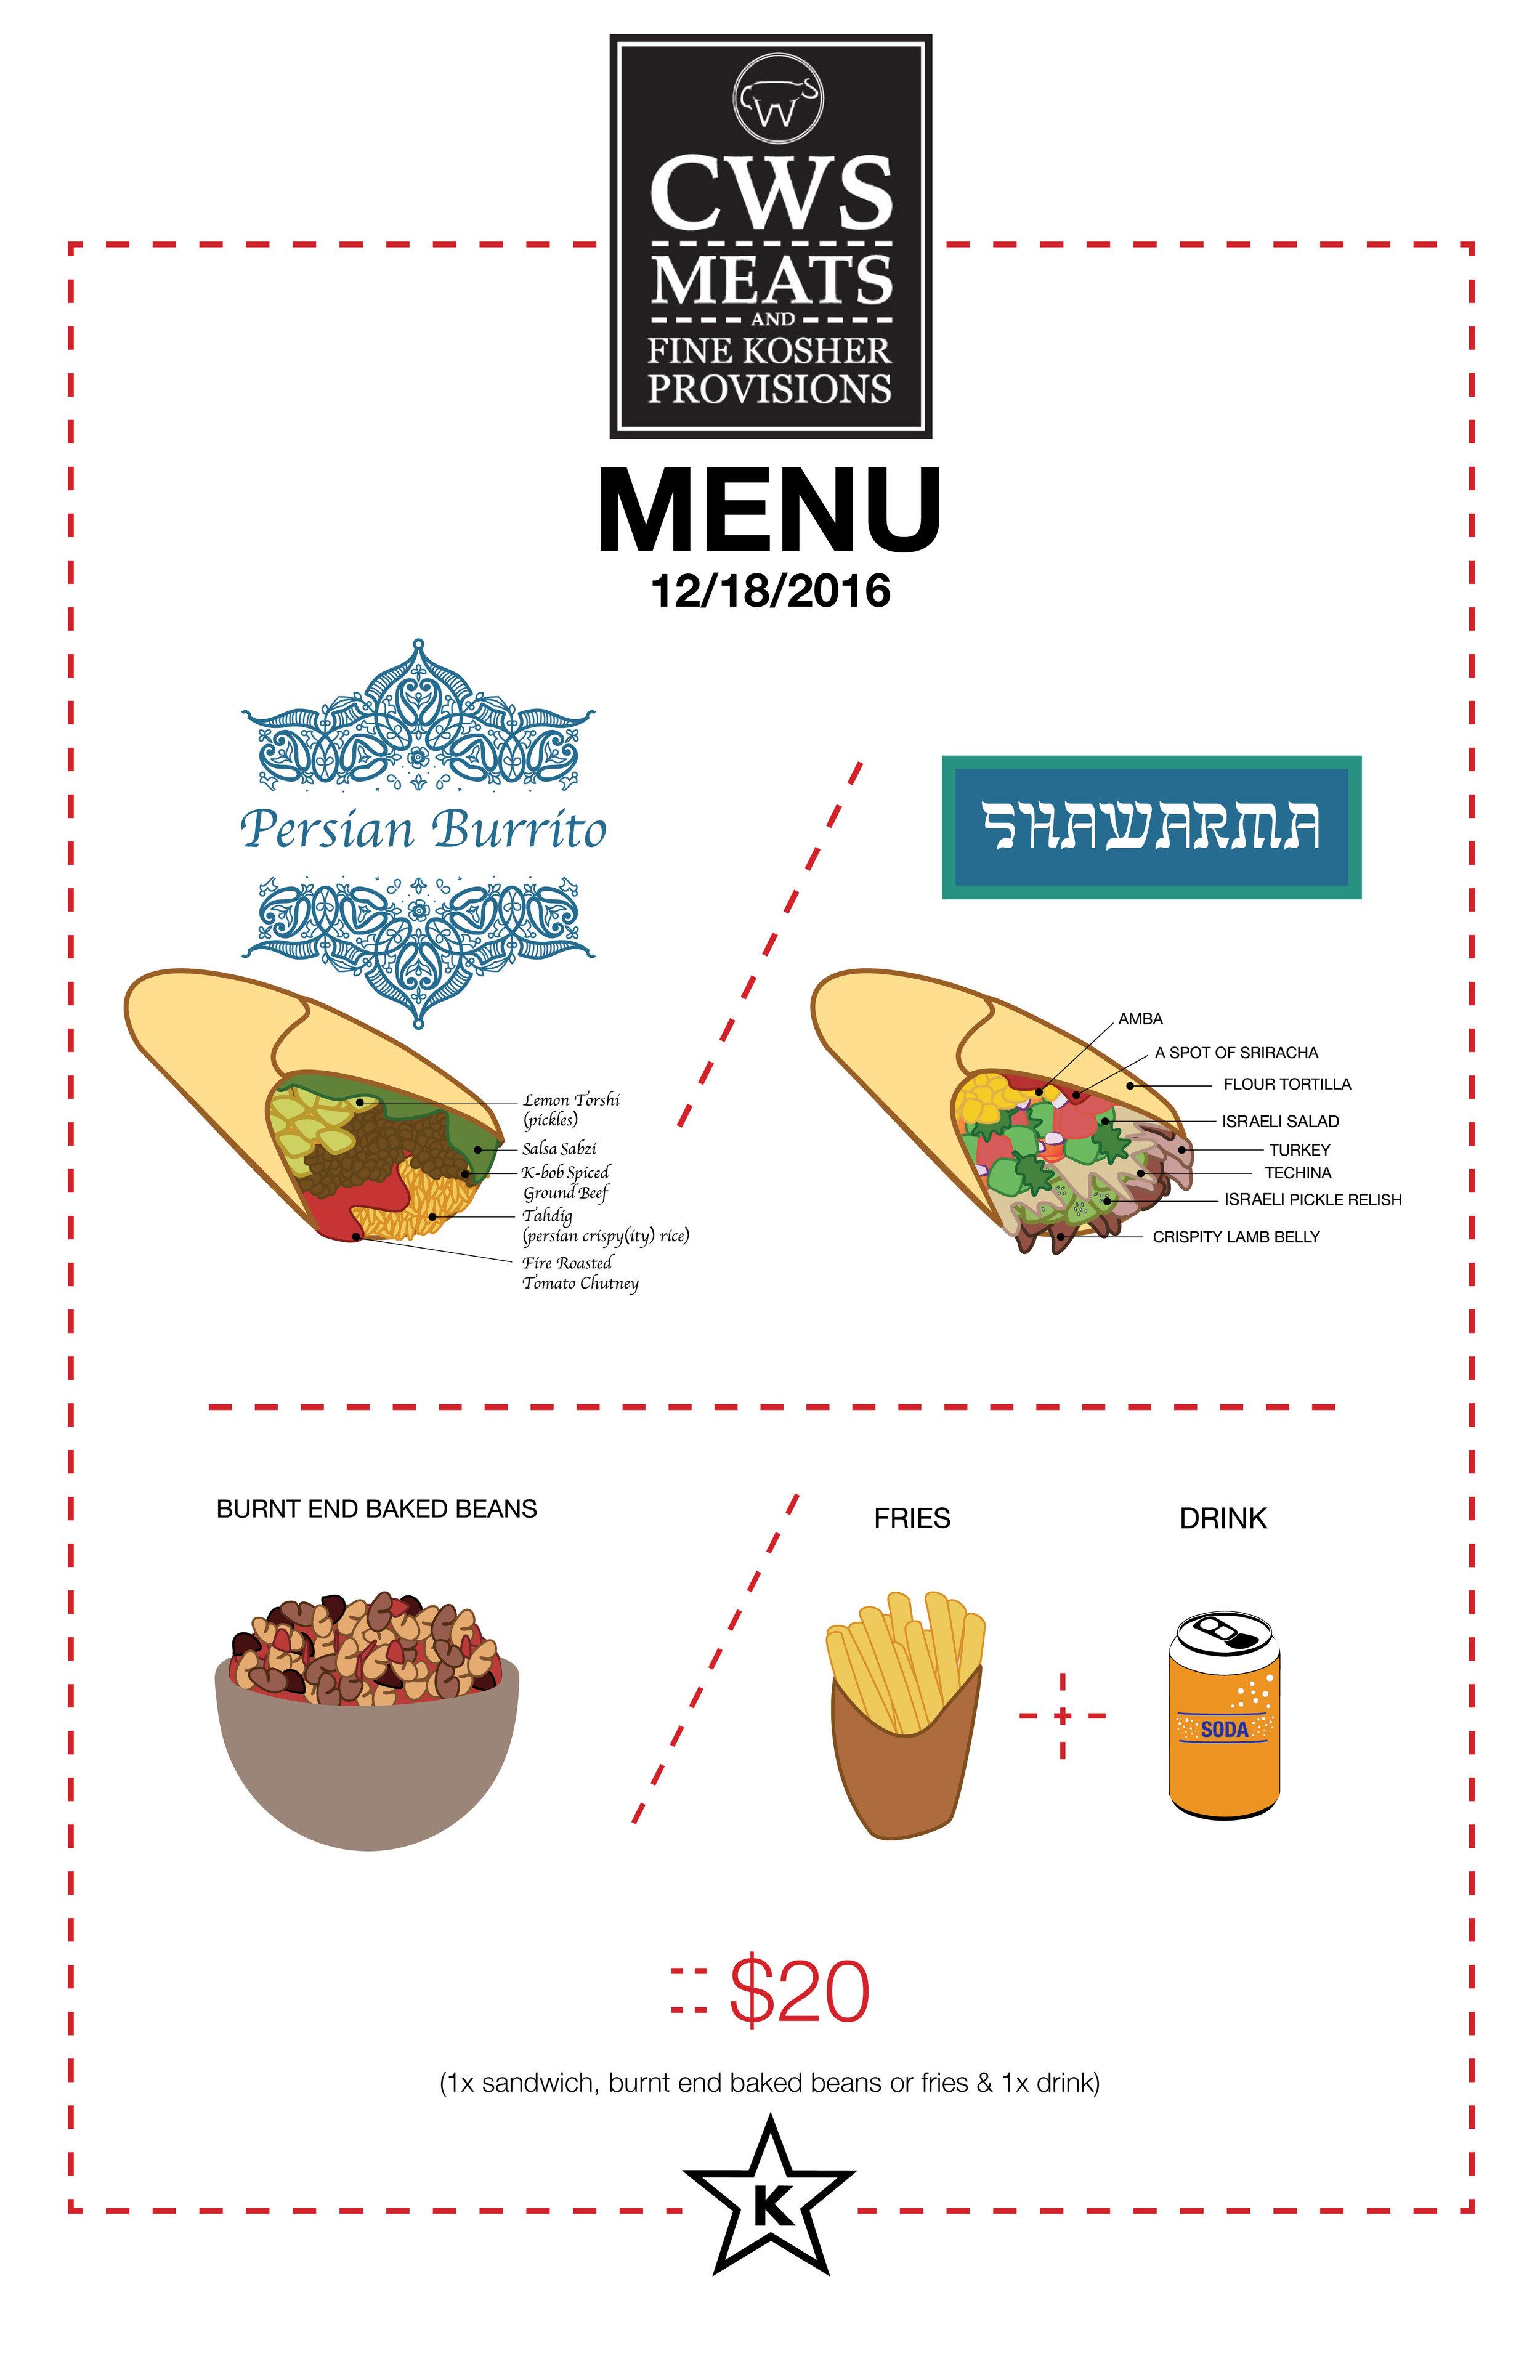 CWS menu 12/18/16